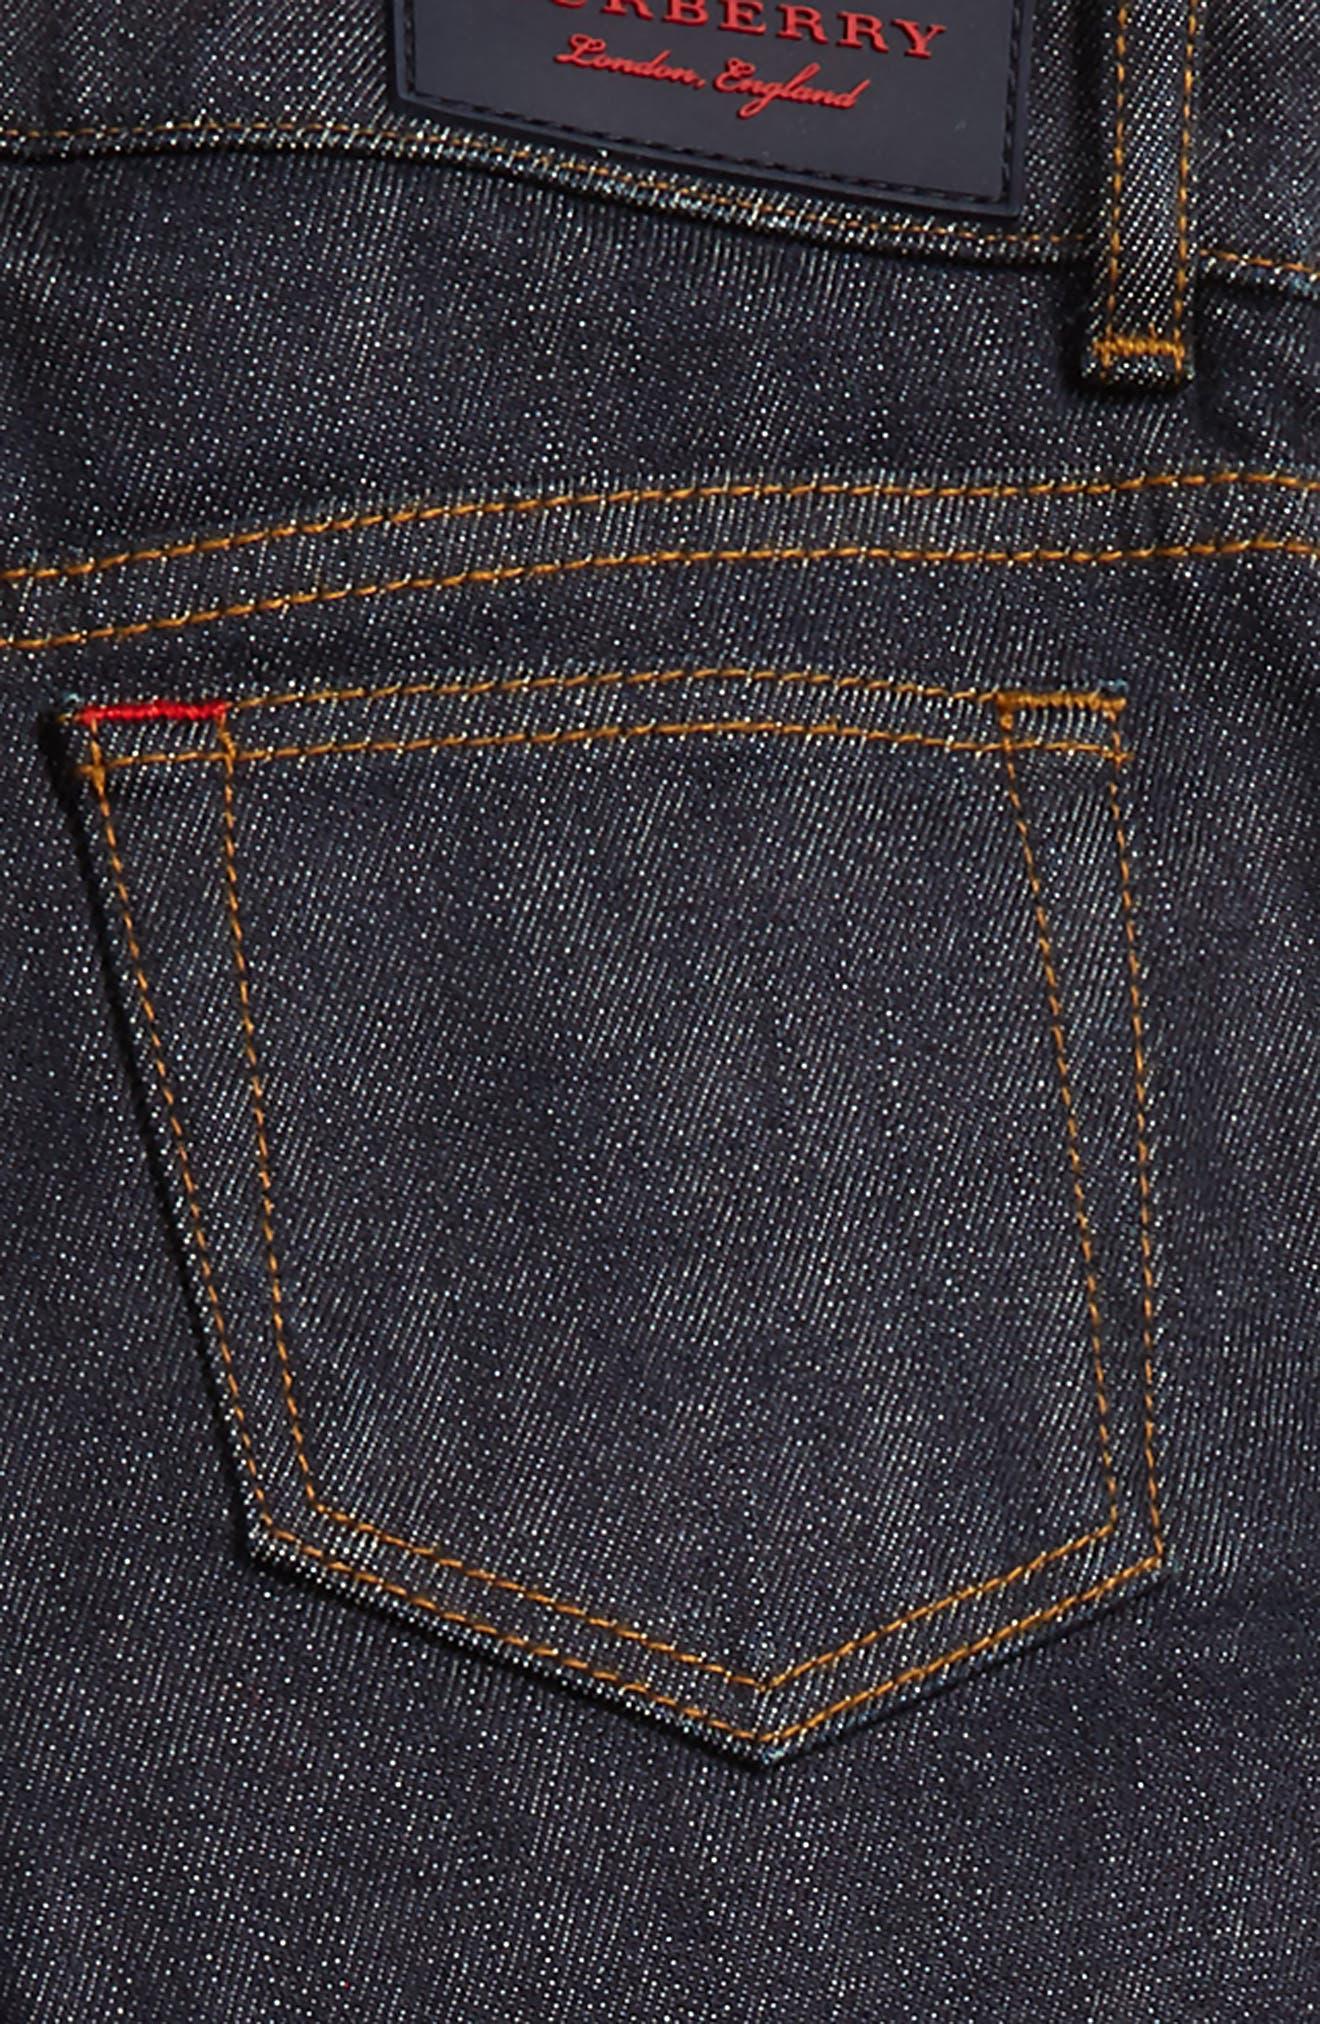 Check Cuff Straight Leg Jeans,                             Alternate thumbnail 5, color,